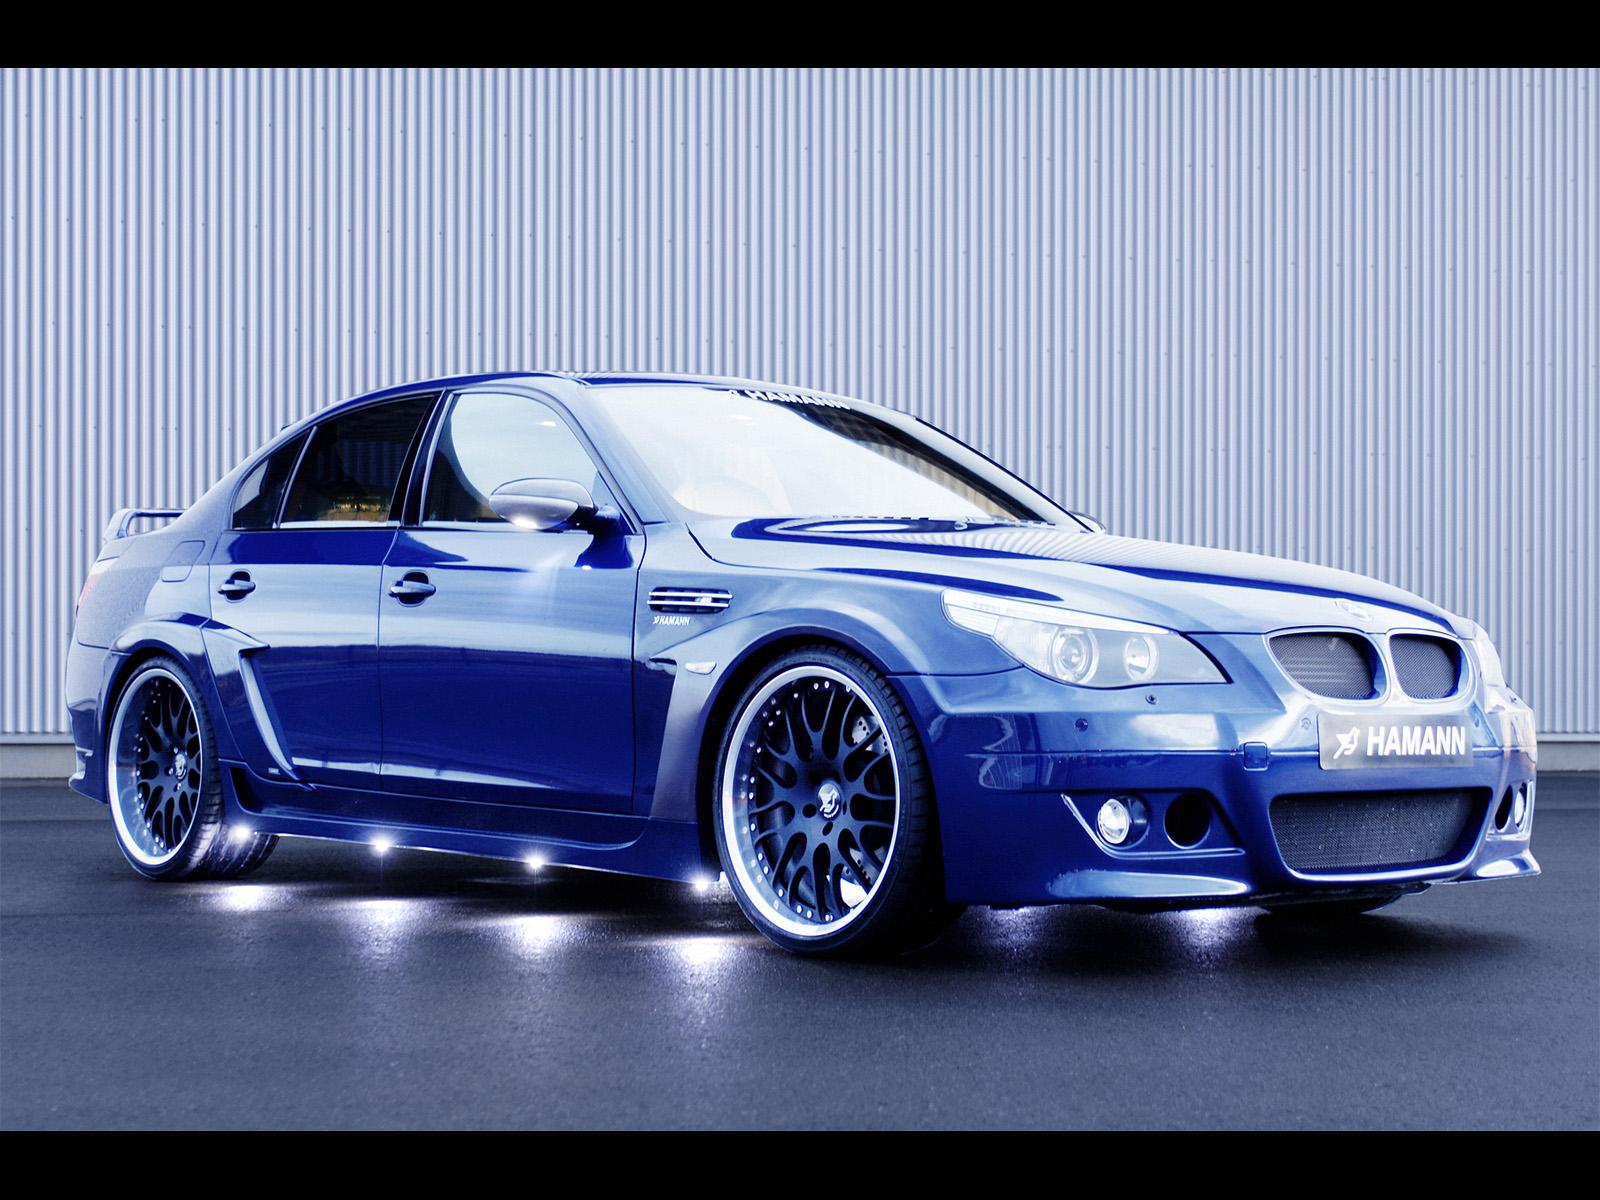 http://4.bp.blogspot.com/-QKmkCRDSkkE/Tr6AOGwhMfI/AAAAAAAAANE/Ak-w95W__FQ/s1600/Blue-hamann-bmw-e60-m5-edition-race-1.jpg